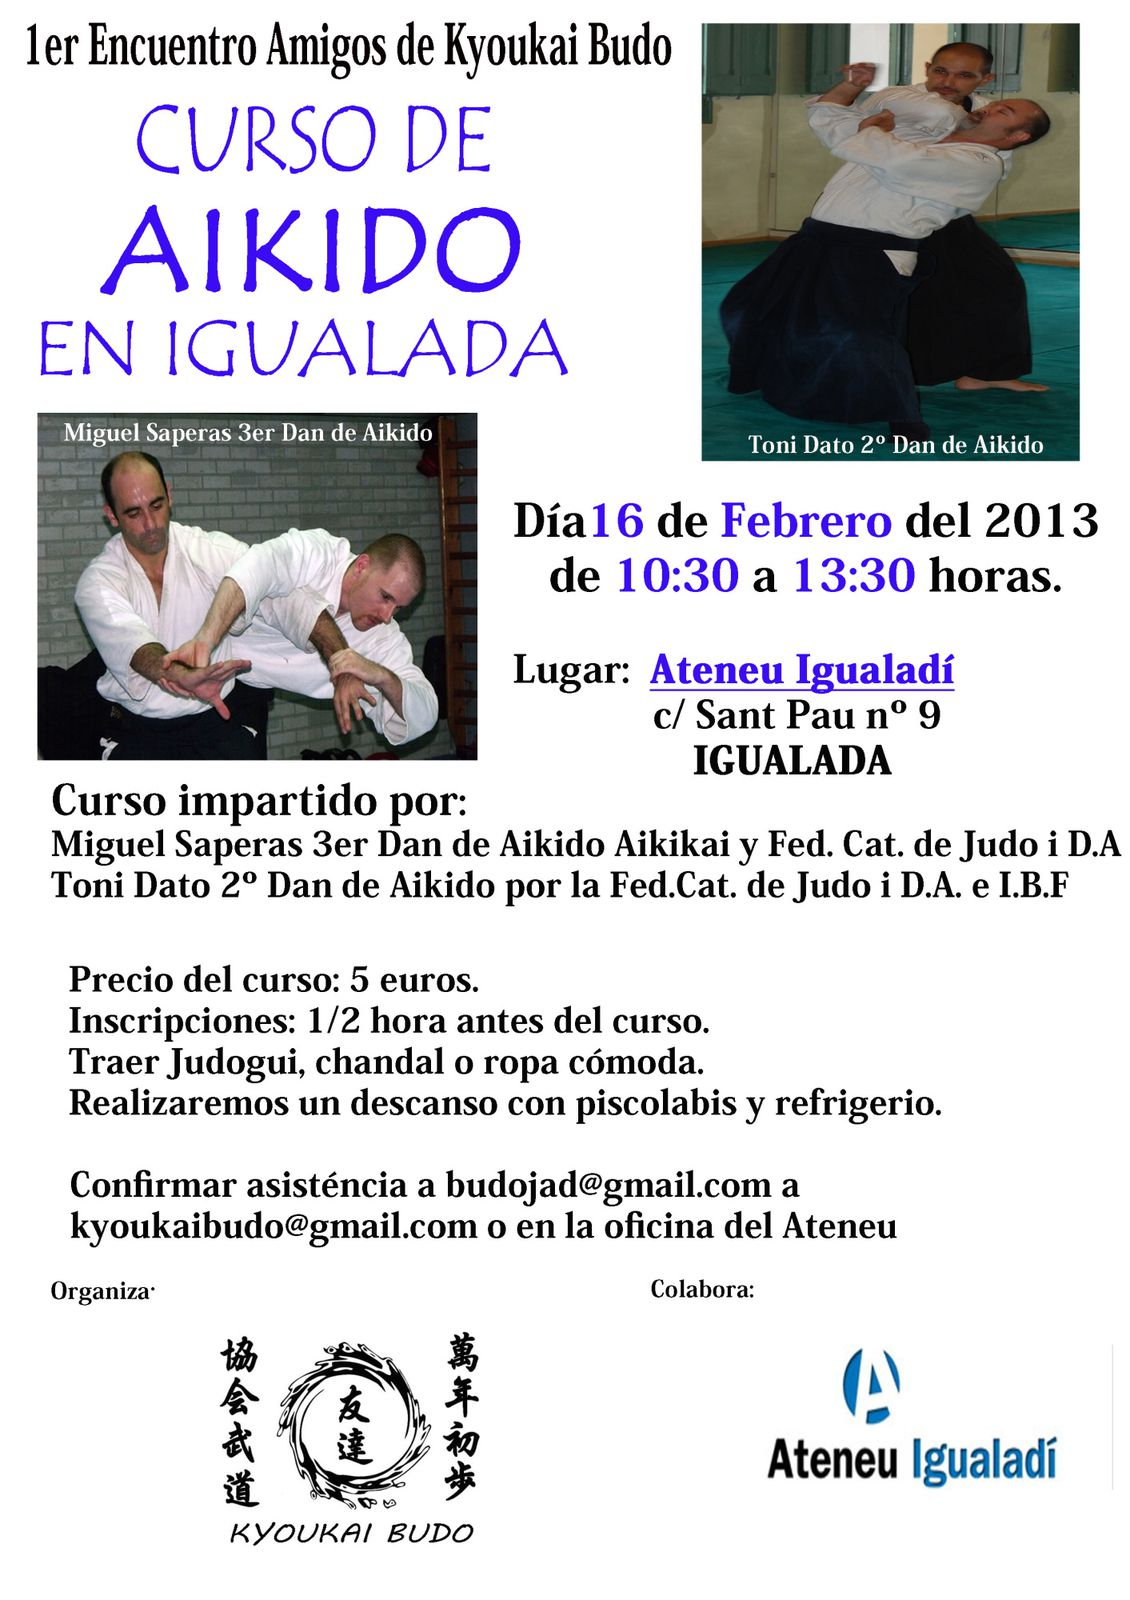 2013-02-16 - Miguel Saperas / Toni Dato